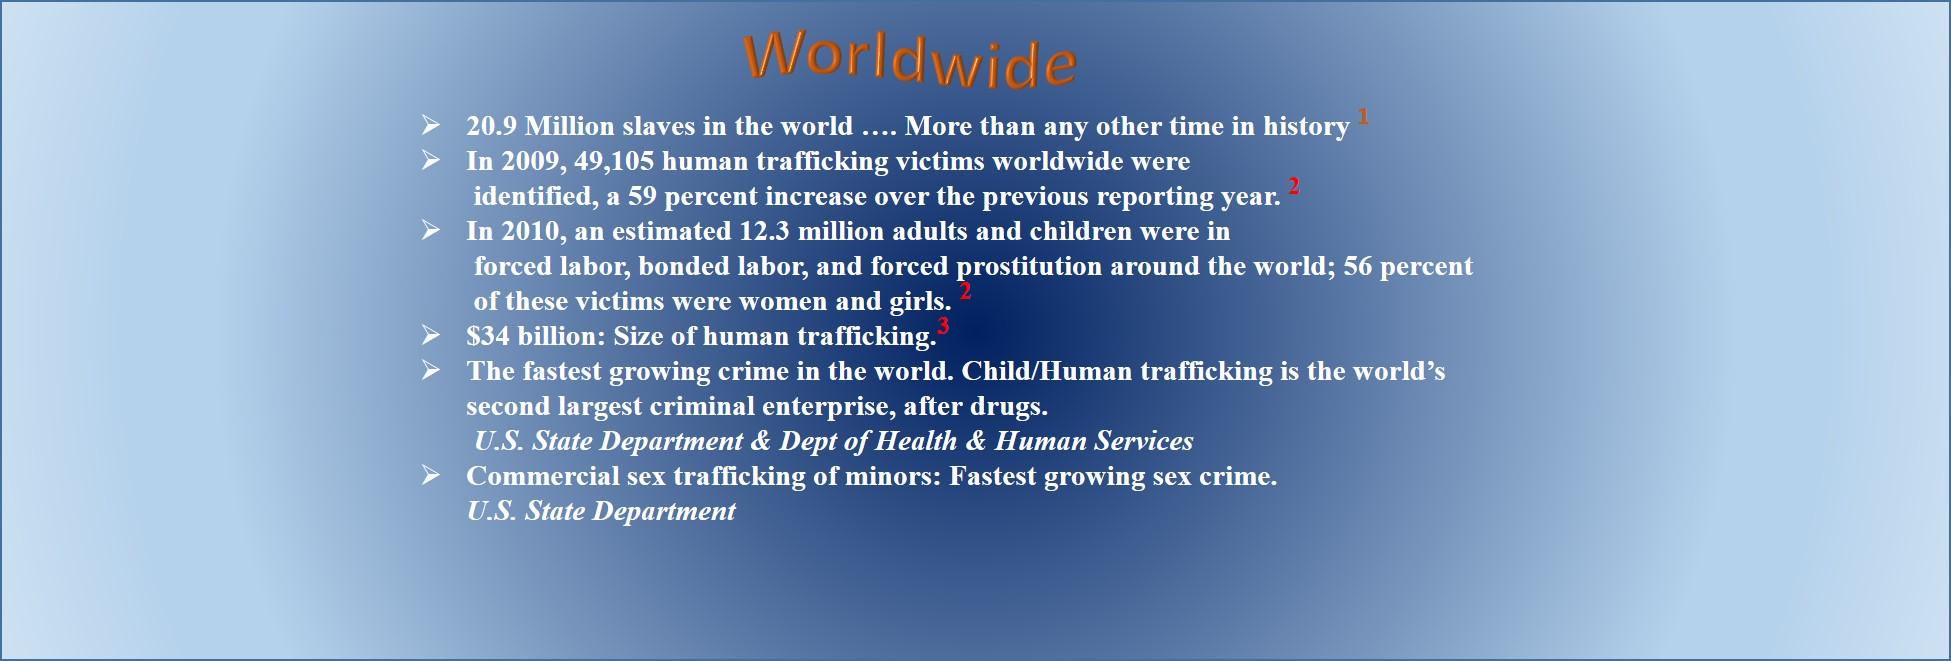 1 Worldwide.jpg